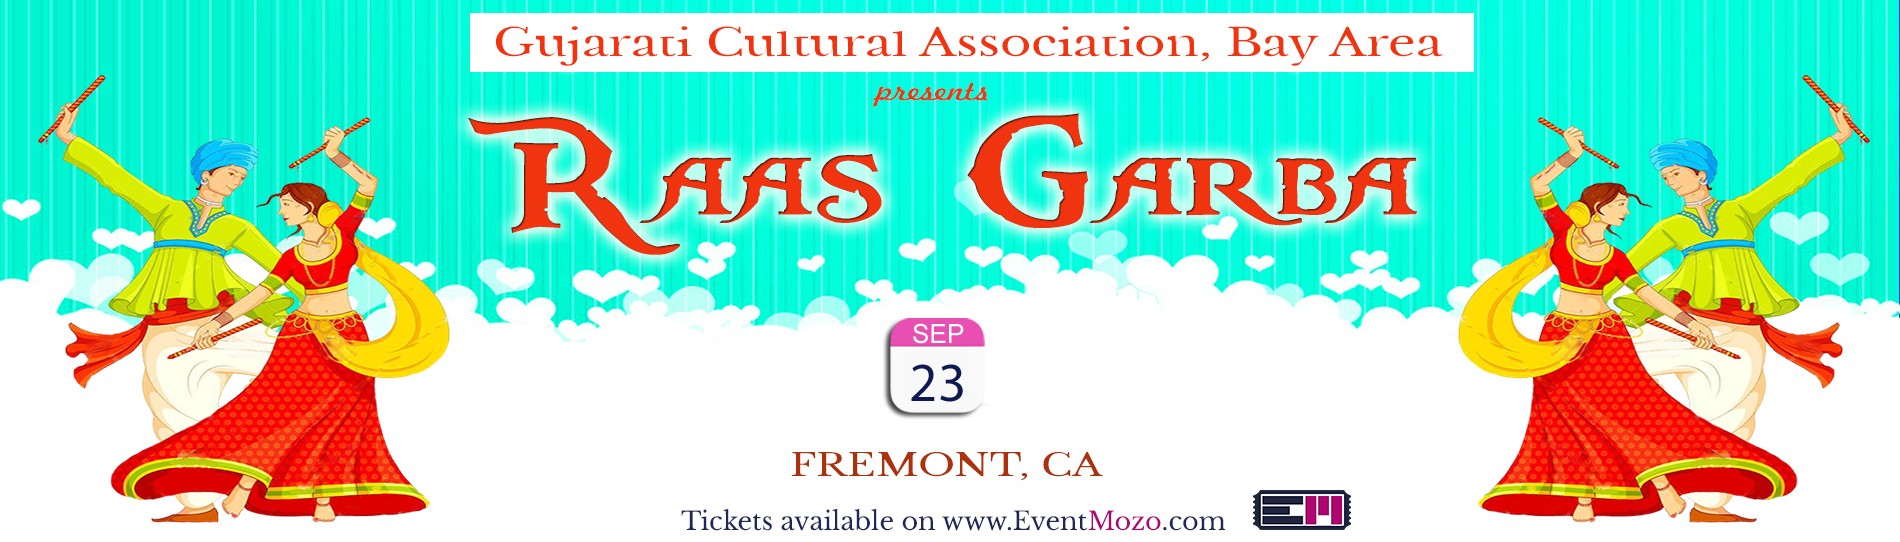 EventMozo GCA Bay Area Raas Garba 2017